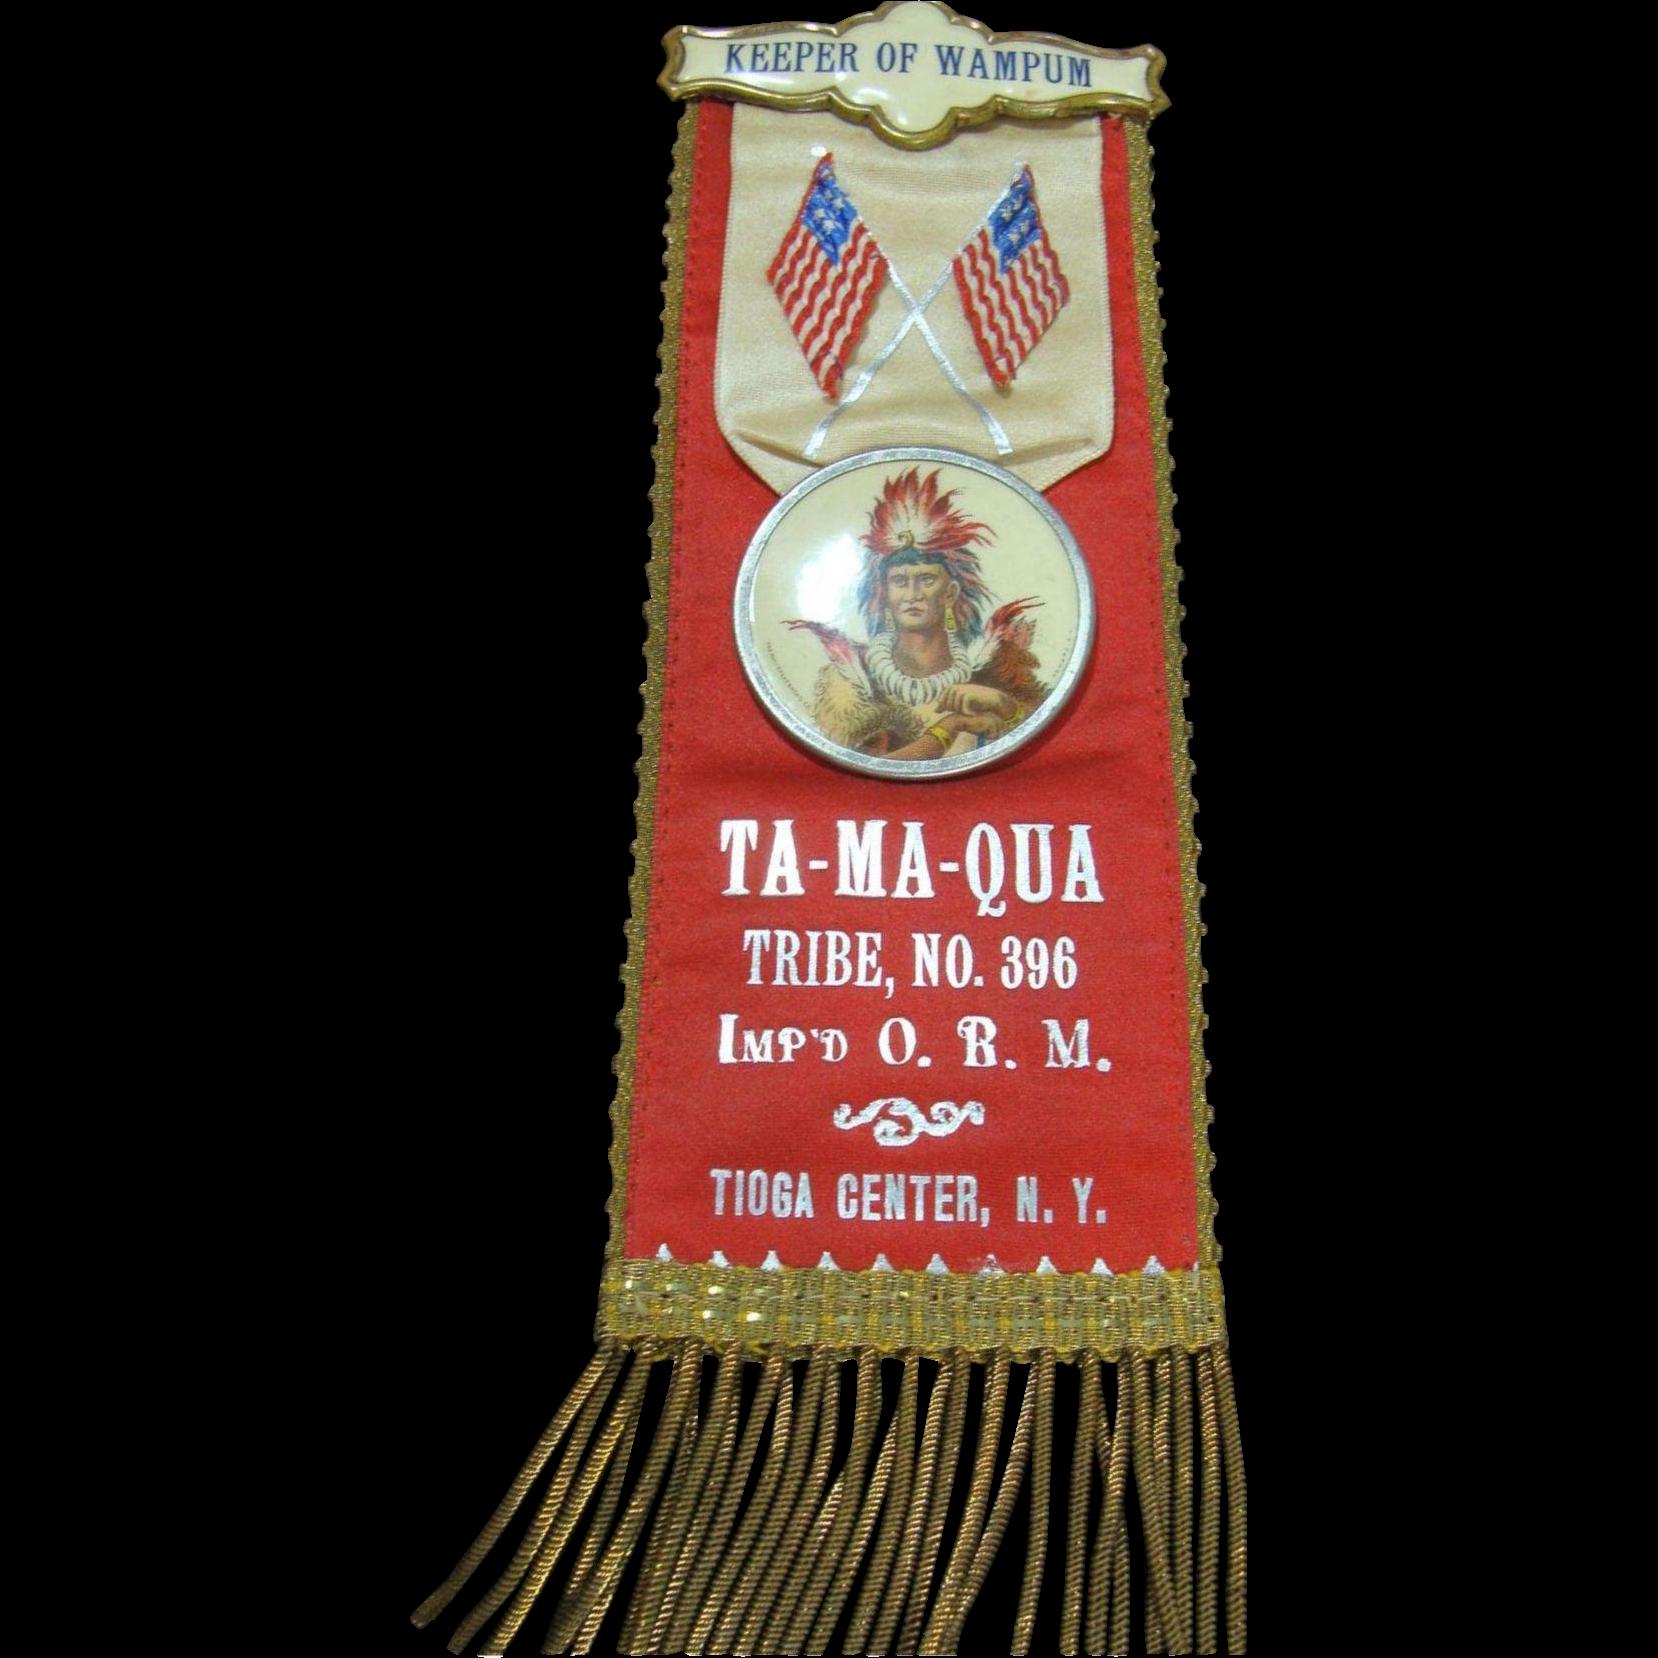 Order of Red Man Wampum Ta-Ma-Qua Badge